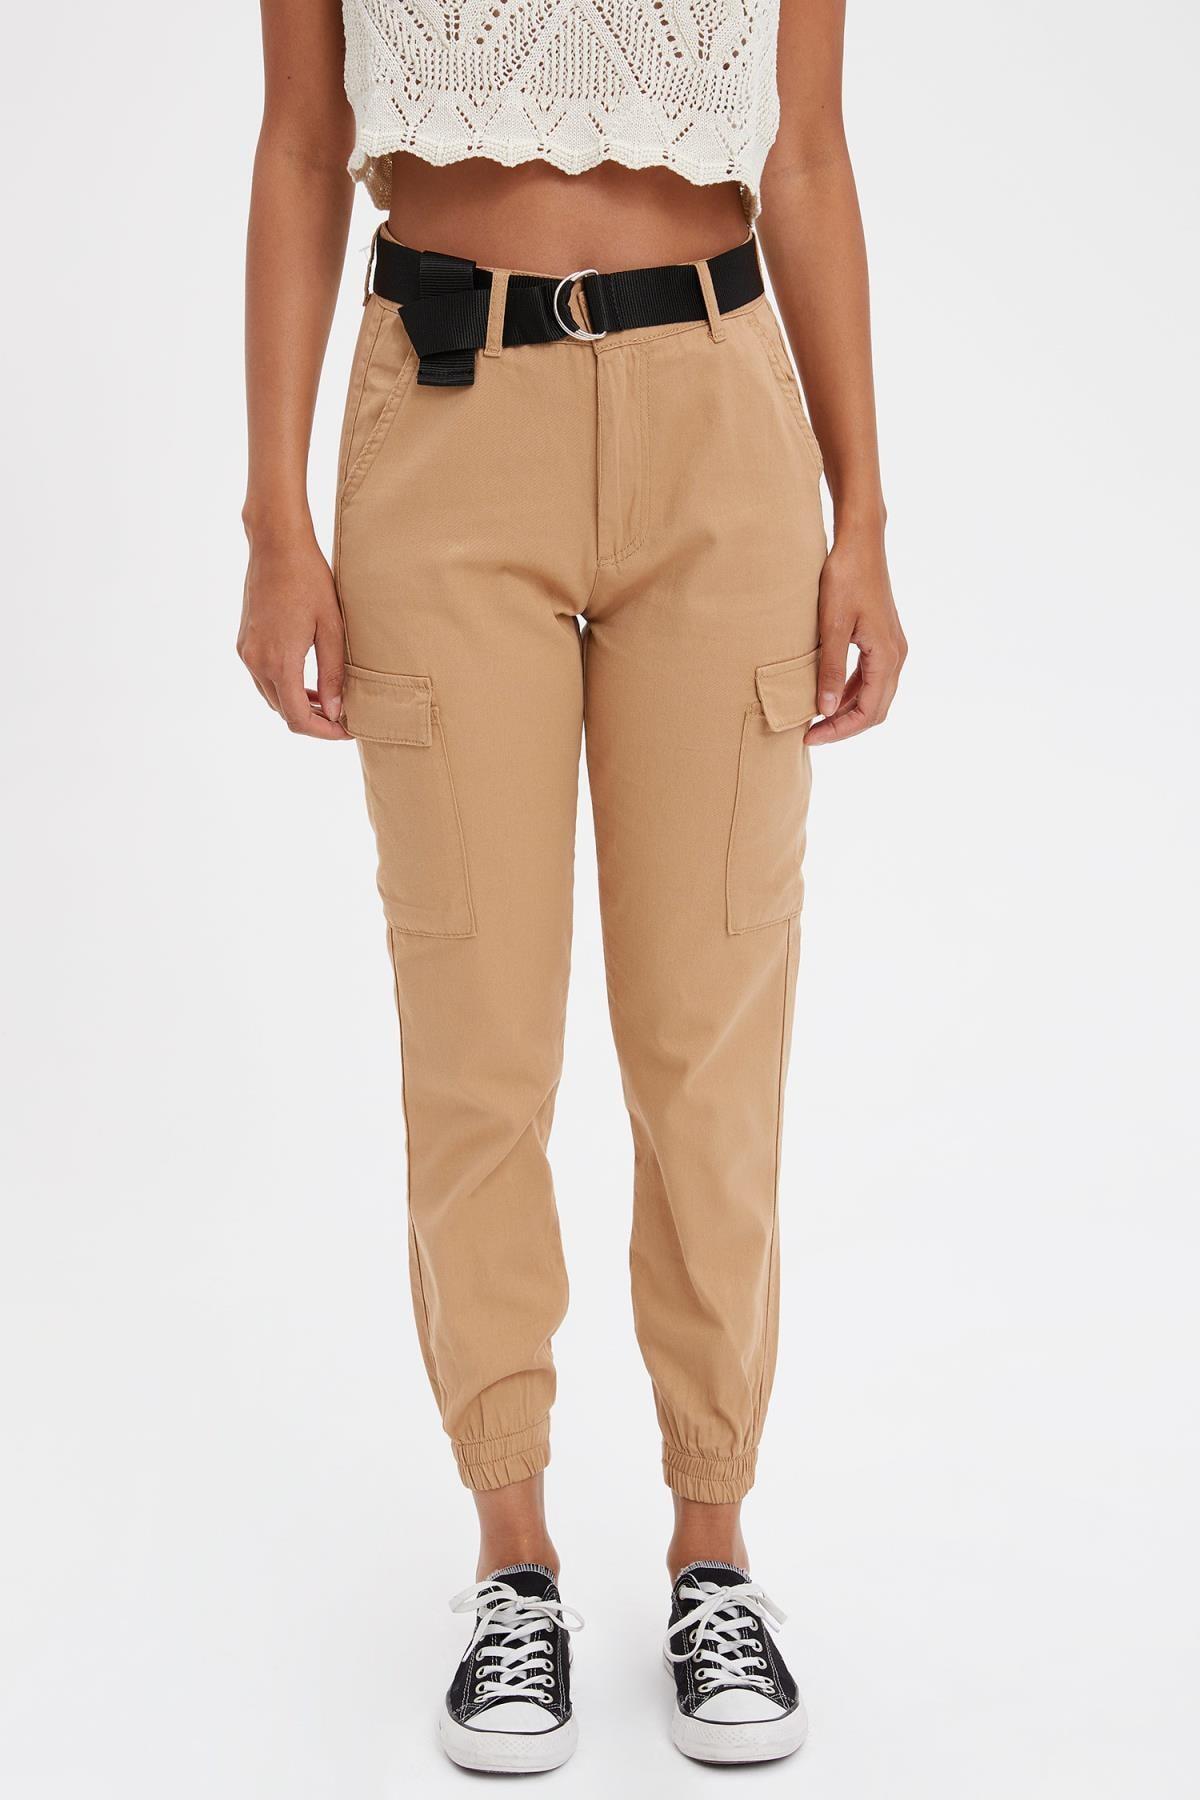 DeFacto Kadın Kahverengi Jogger Pantolon L6284AZ.19SM.BN164 2